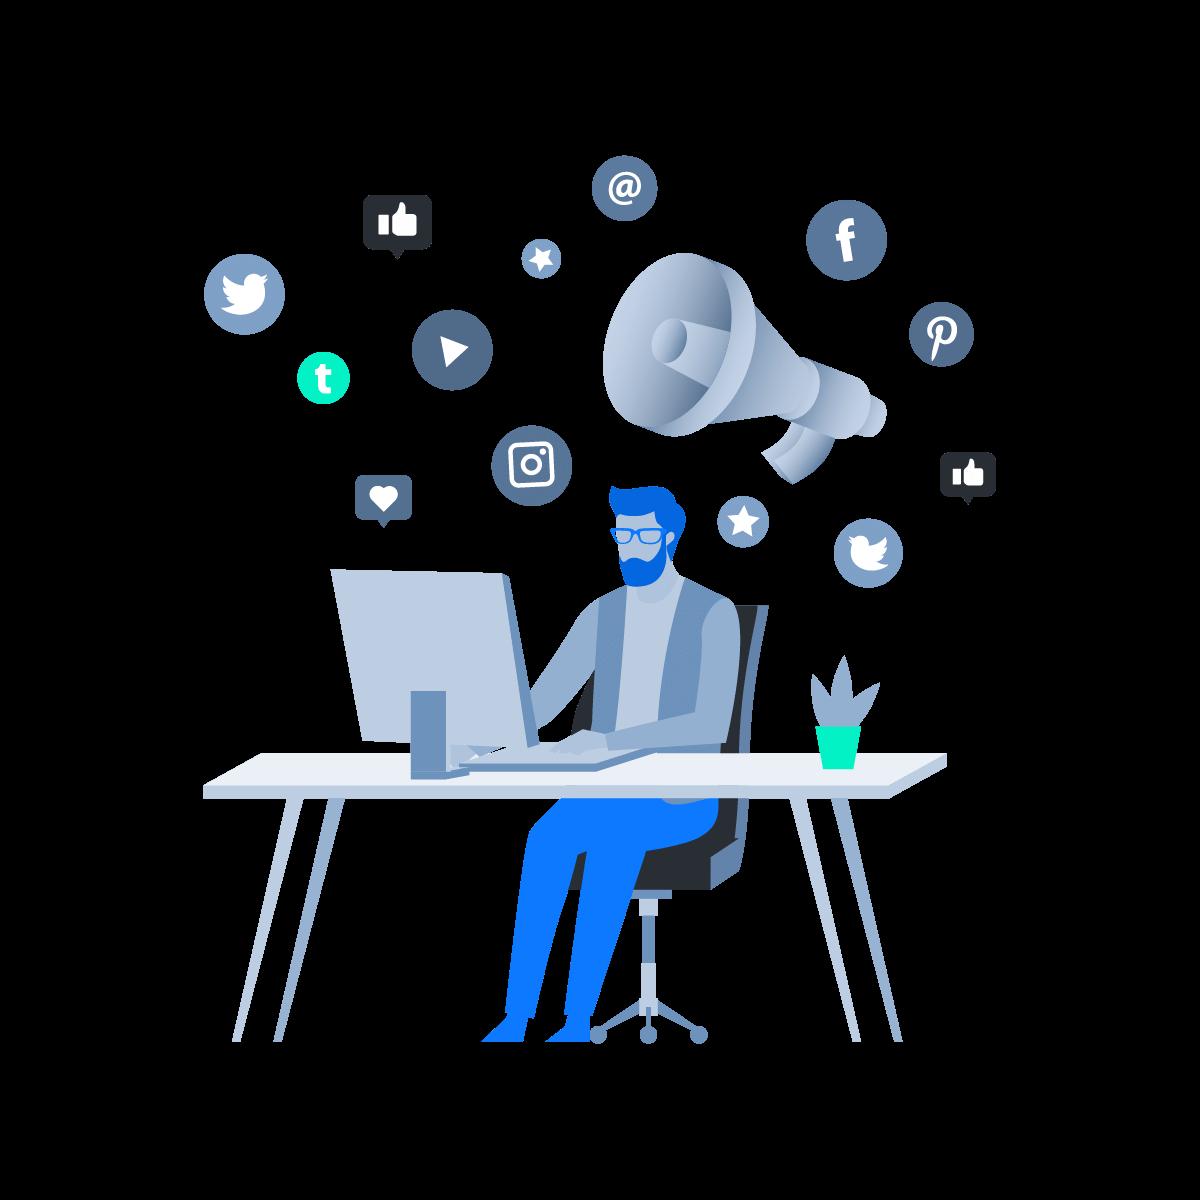 Artboard 10 - Social media marketing services